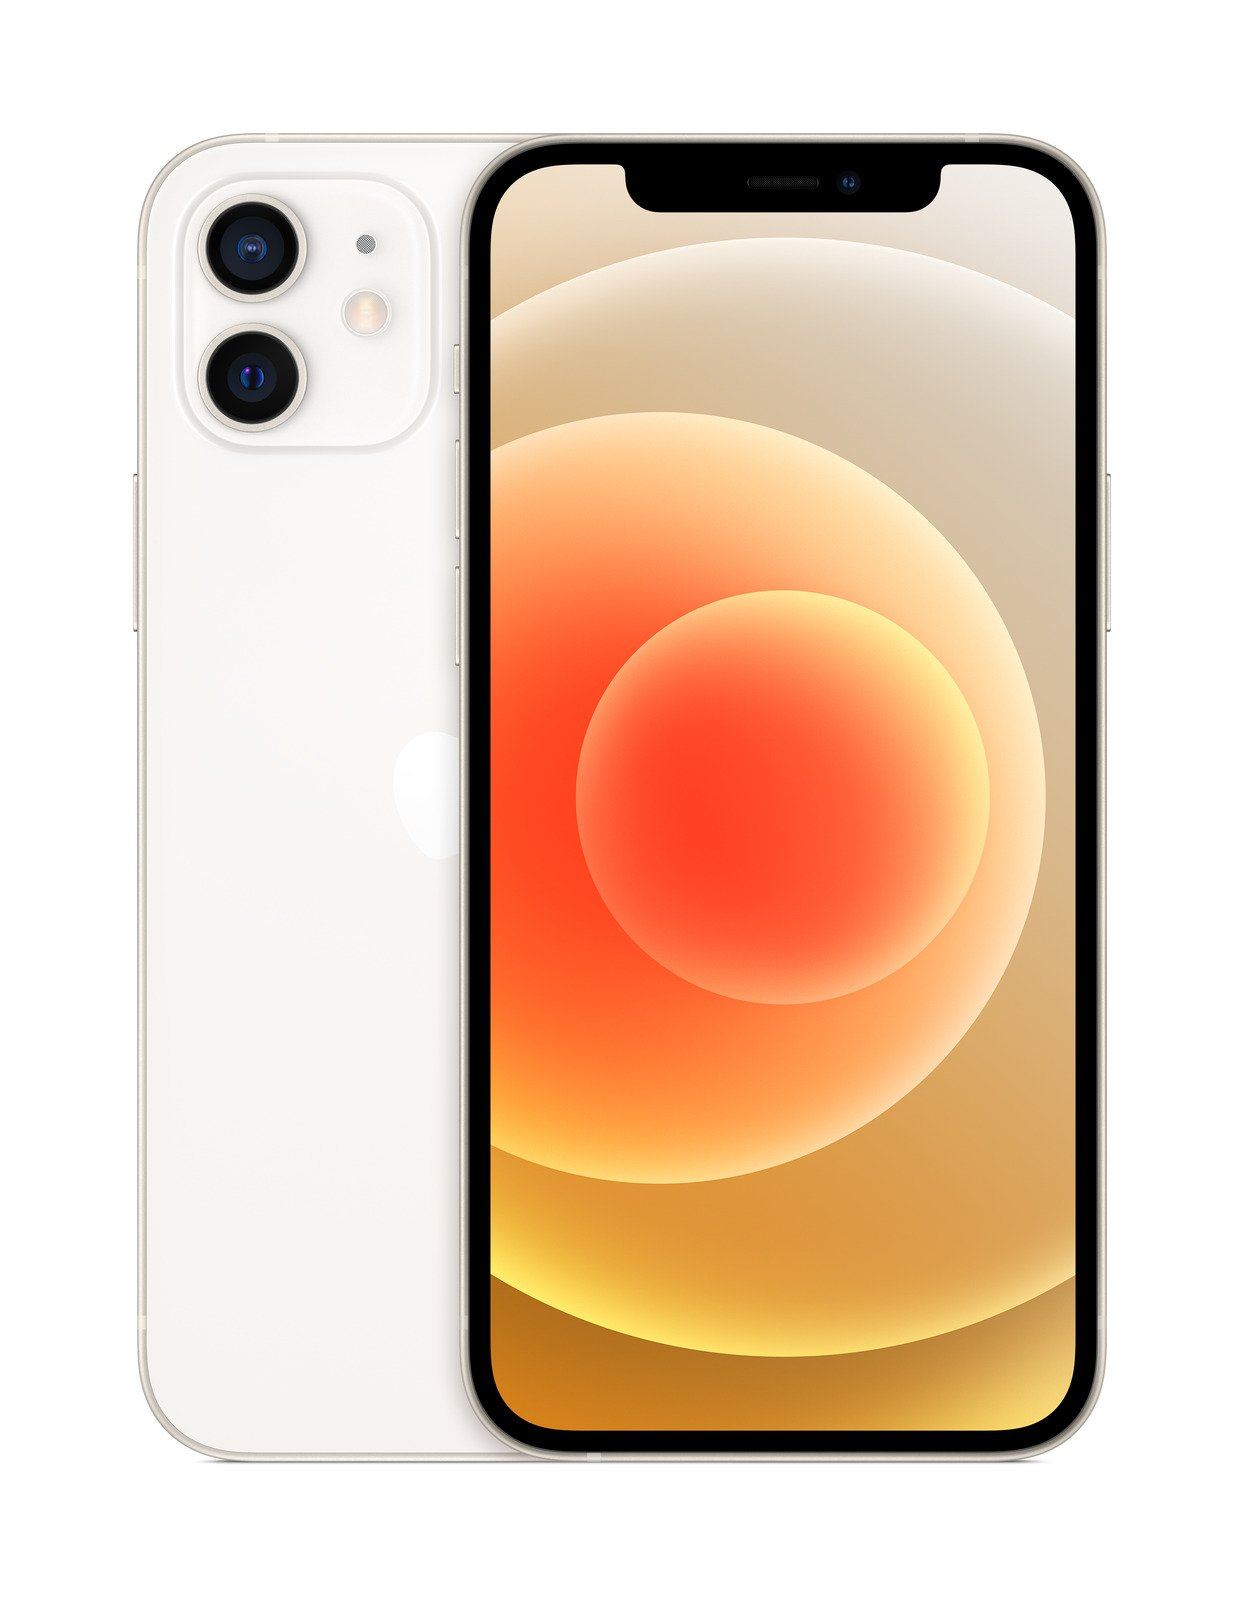 Apple iPhone 12 128GB weis (Super Retina XDR Display, 5G, FaceTime, 4K Videoaufnahme, MGJC3ZD/A) MGJC3ZD/A Mobilais Telefons